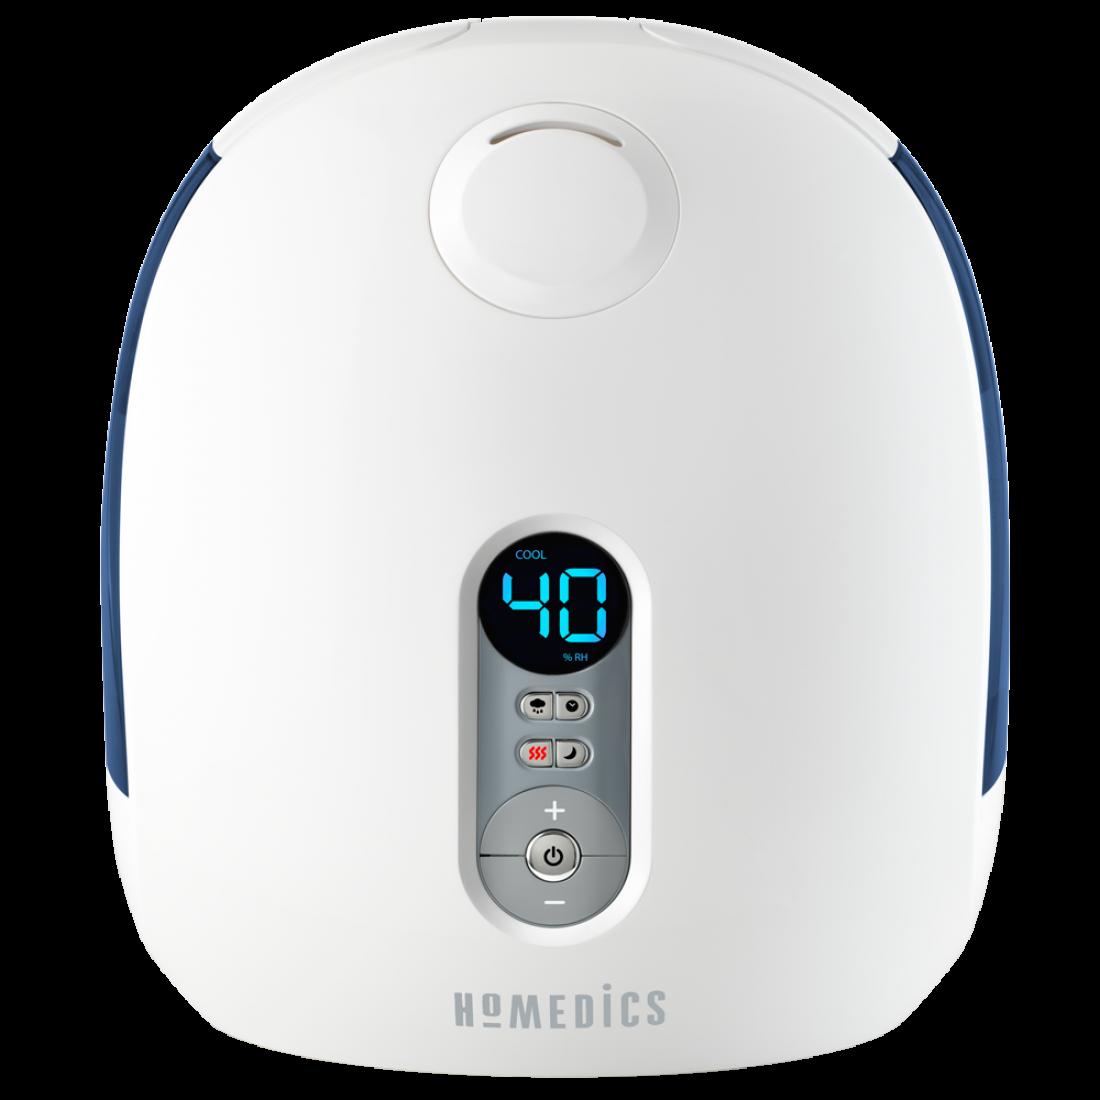 Homedics Warm And Cool Mist Dual Tank Ultrasonic Humidifier Uhe Wm250 Homedics Com Humidifier Home D Cool Mist Humidifier